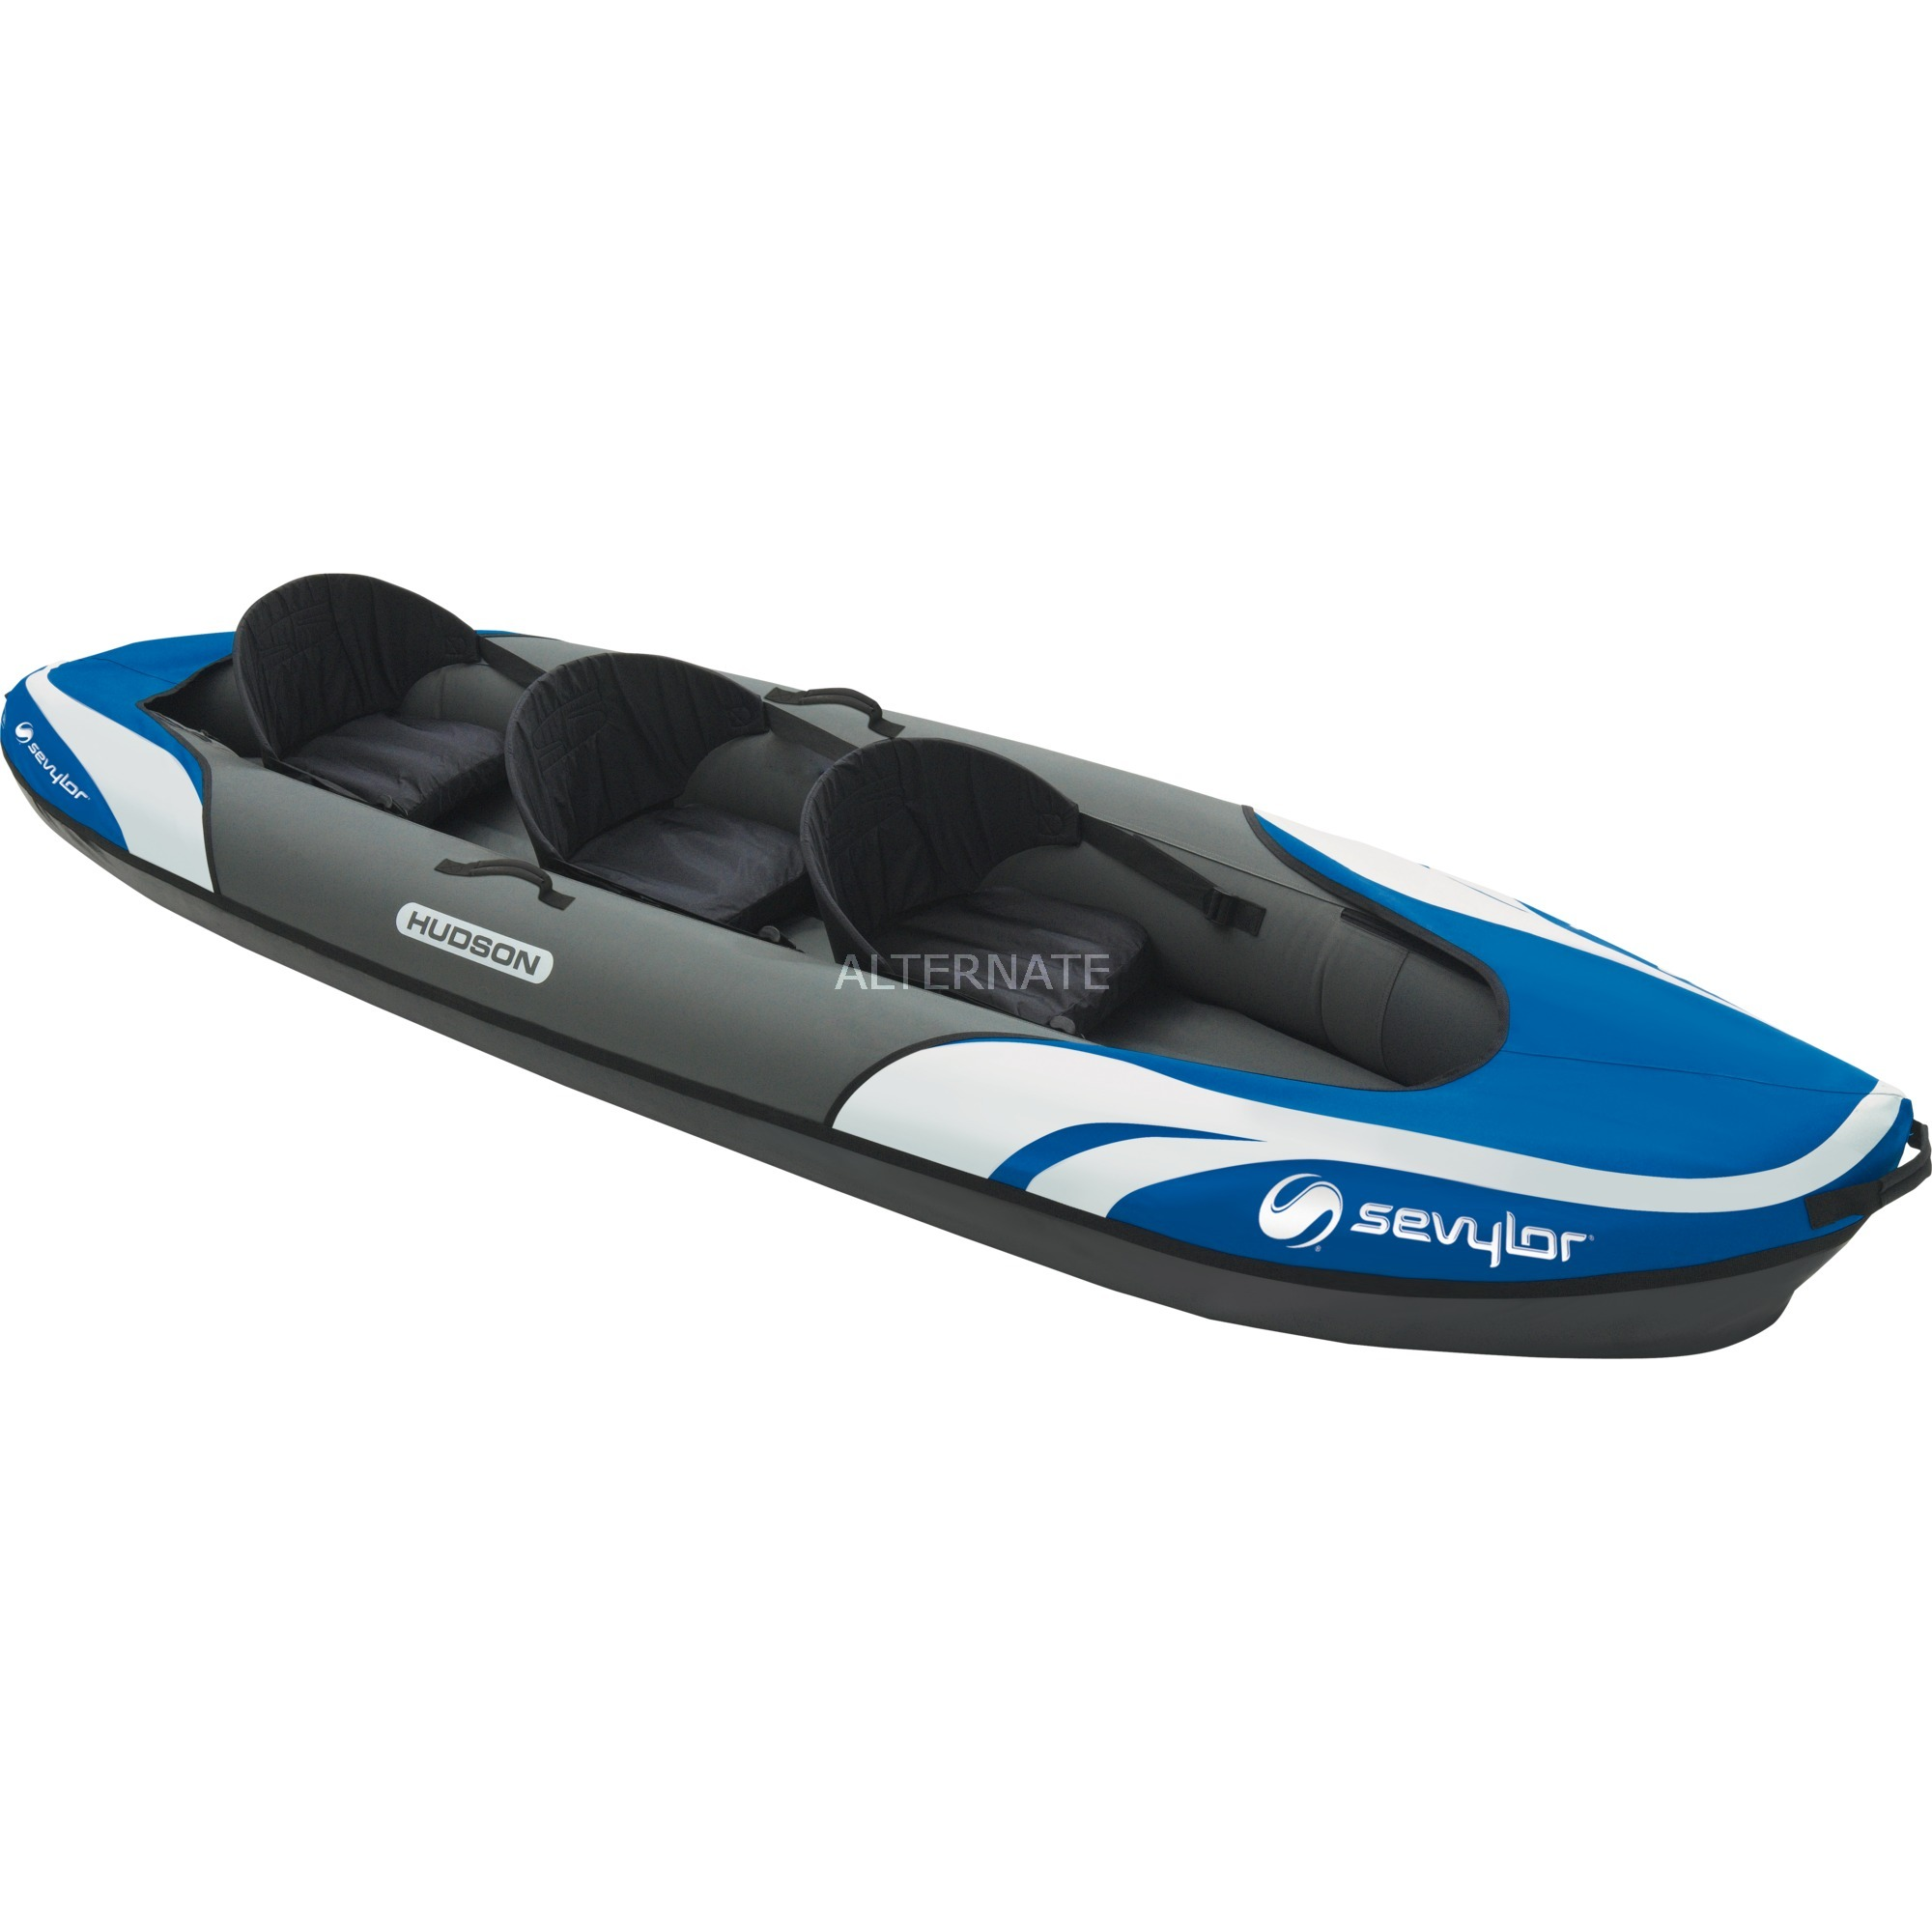 Hudson kayaks deportivos, Barco inflable